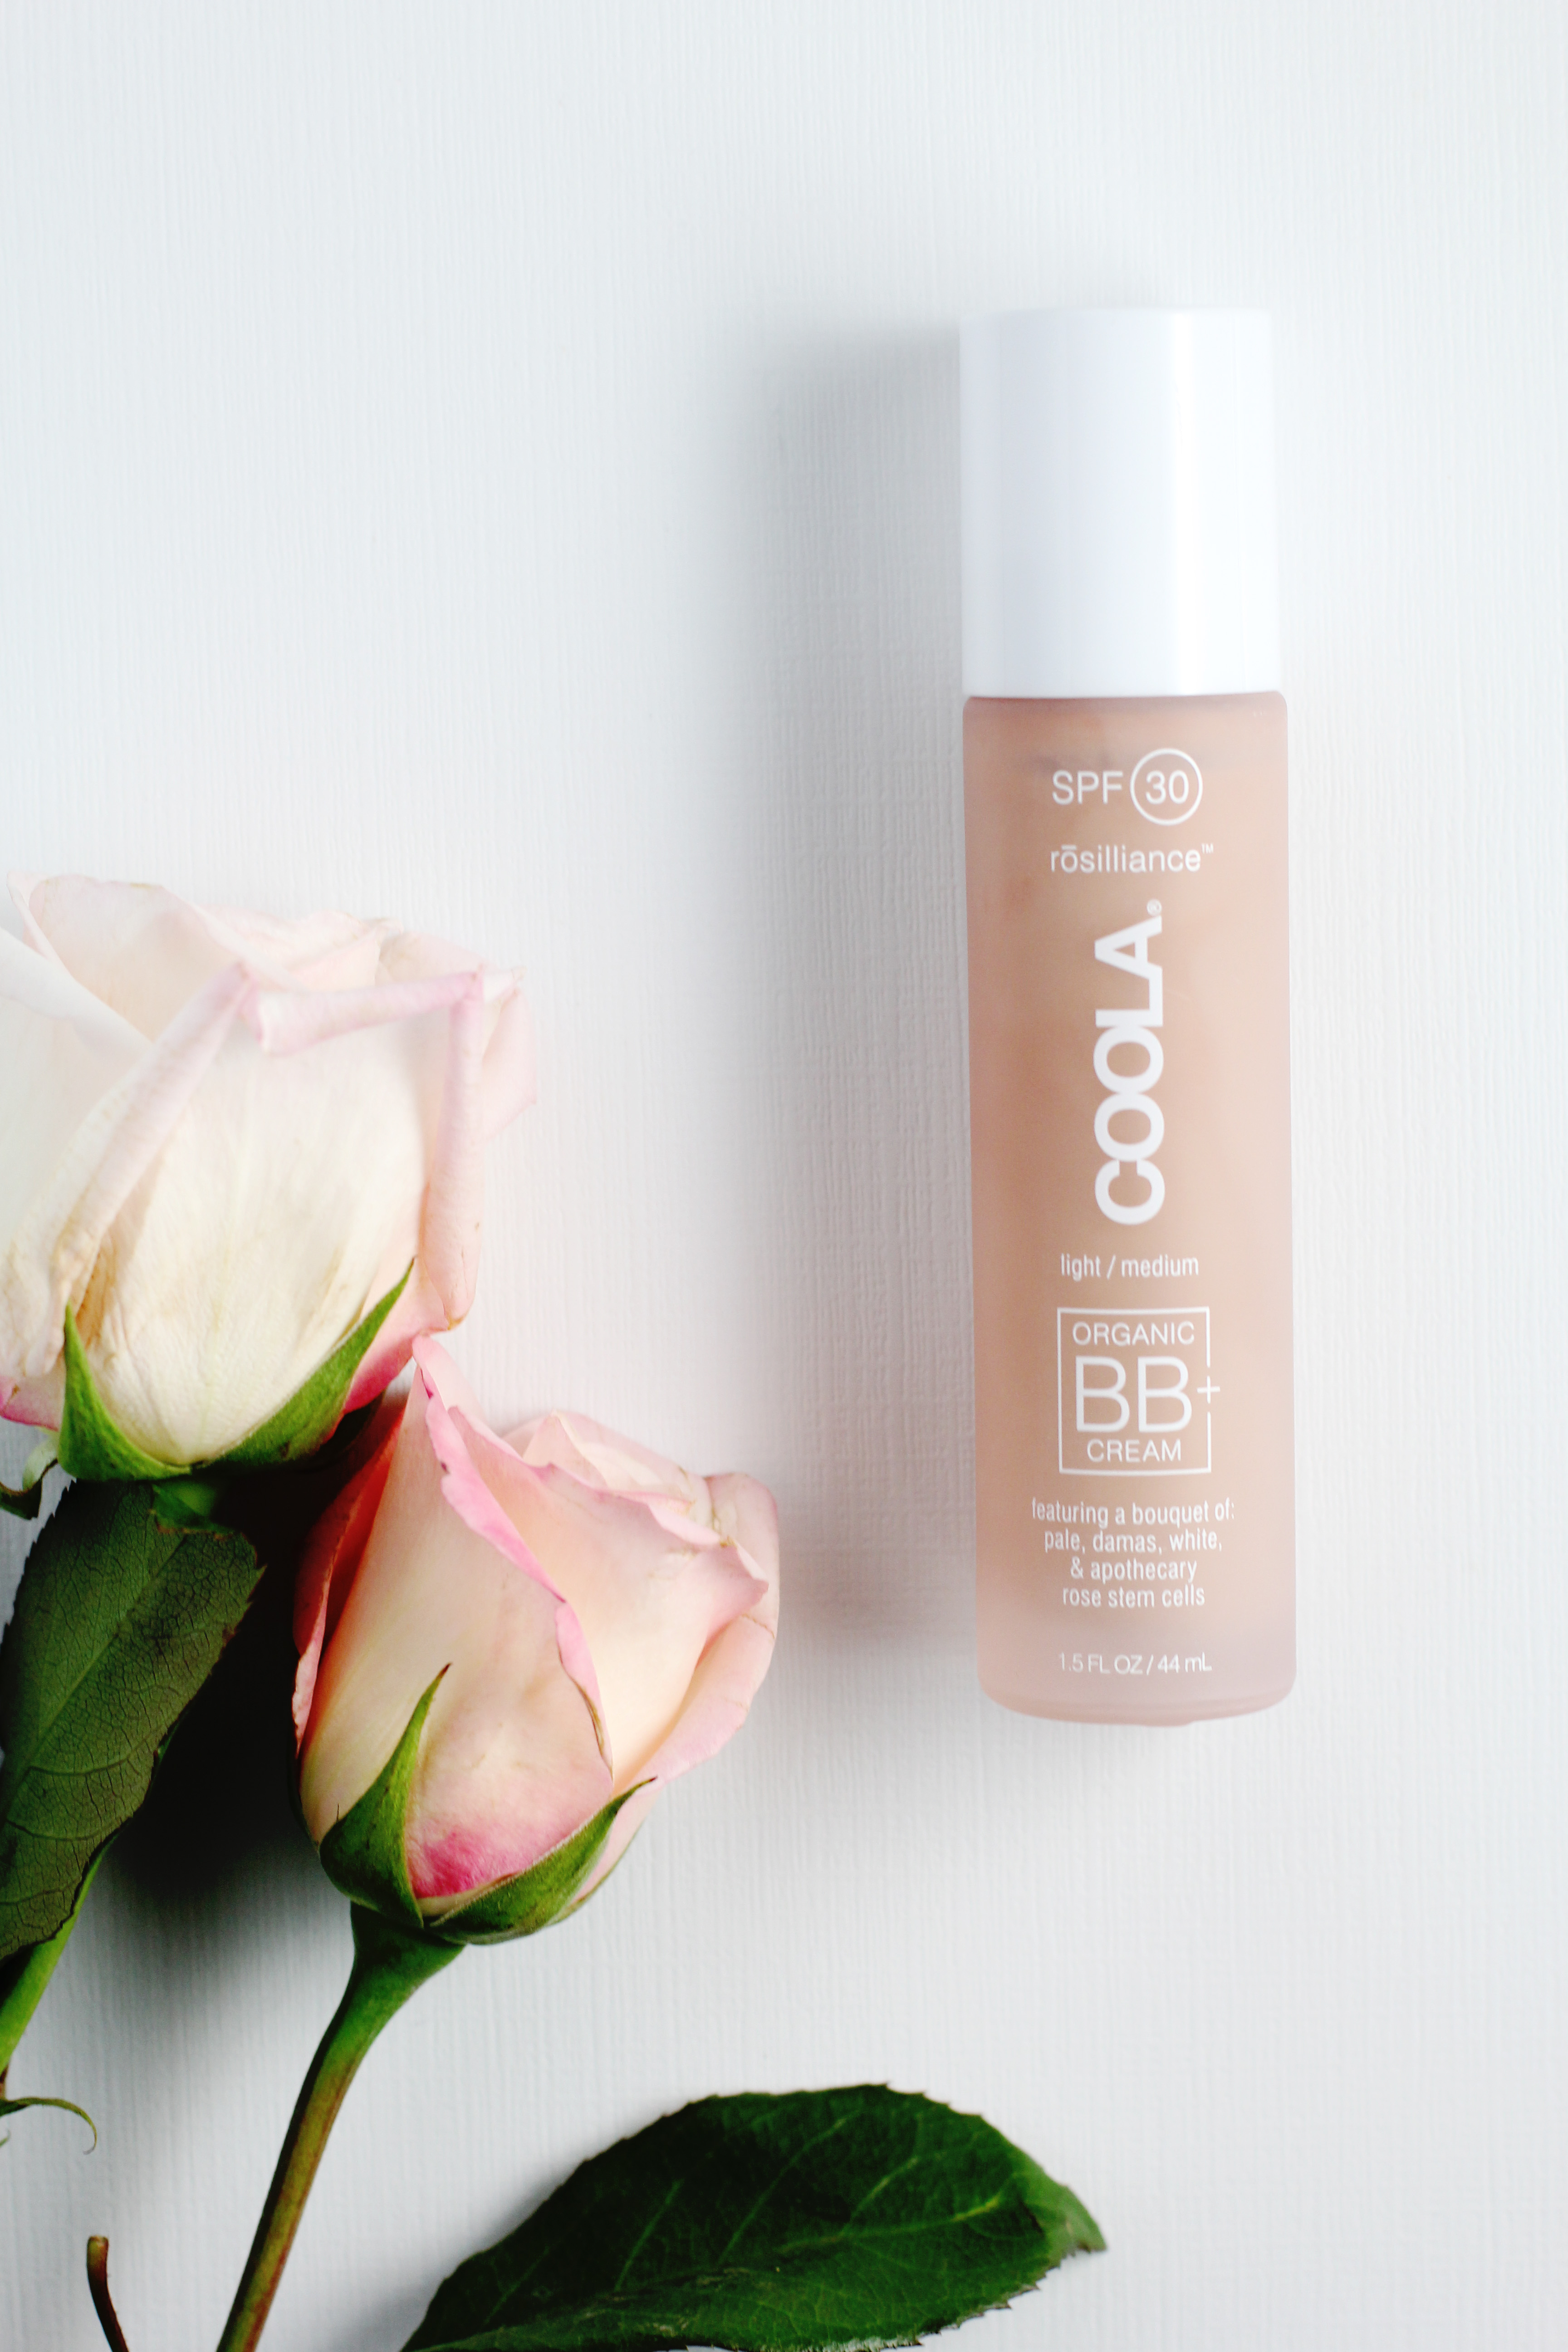 coola-rosilliance-organic-bb-cream-spf-30